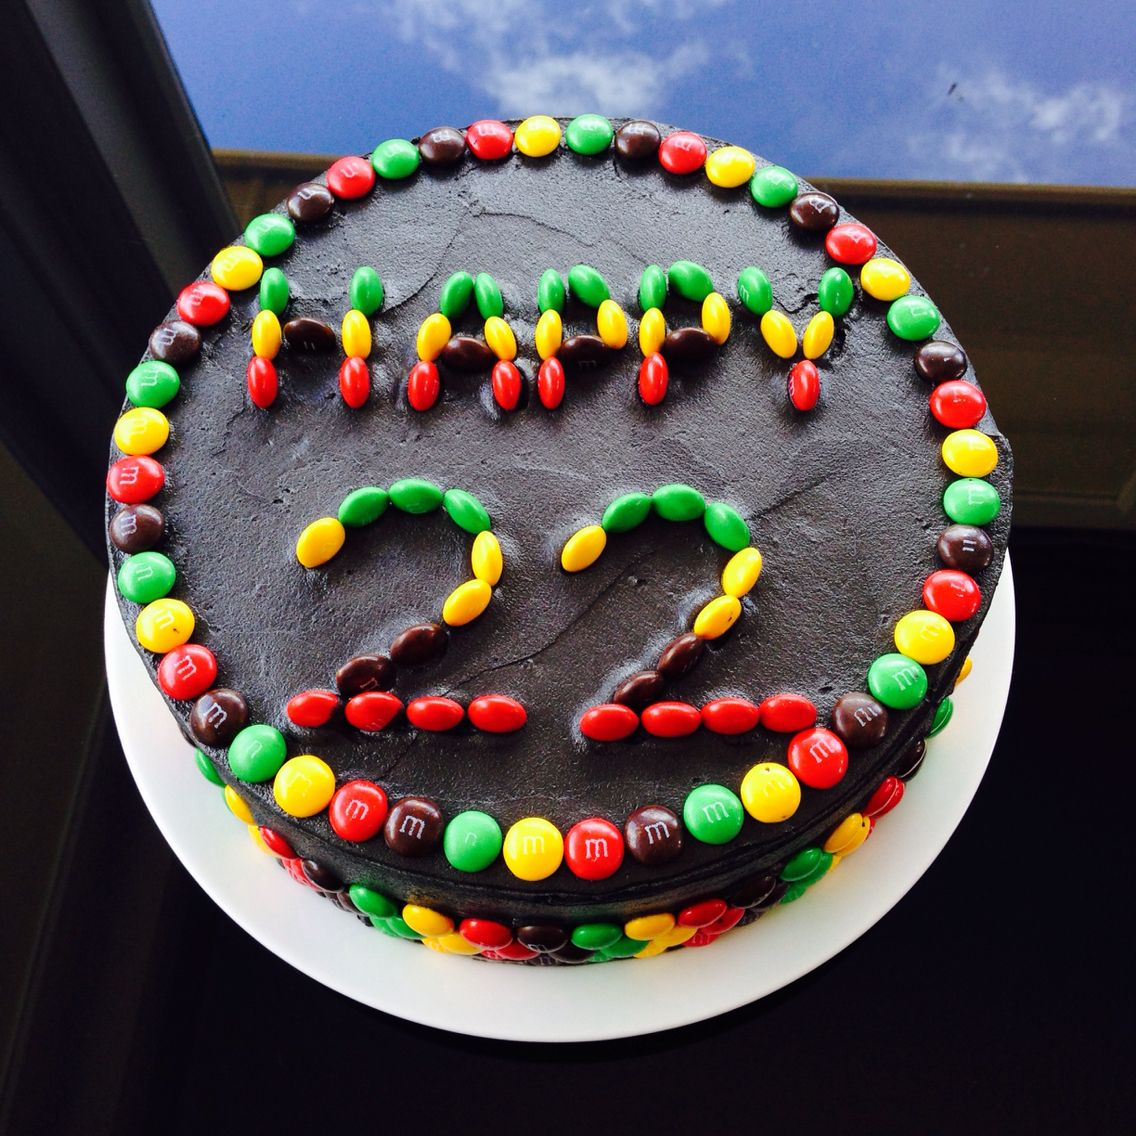 Rasta Cake Ideas Black Icing With M&ms